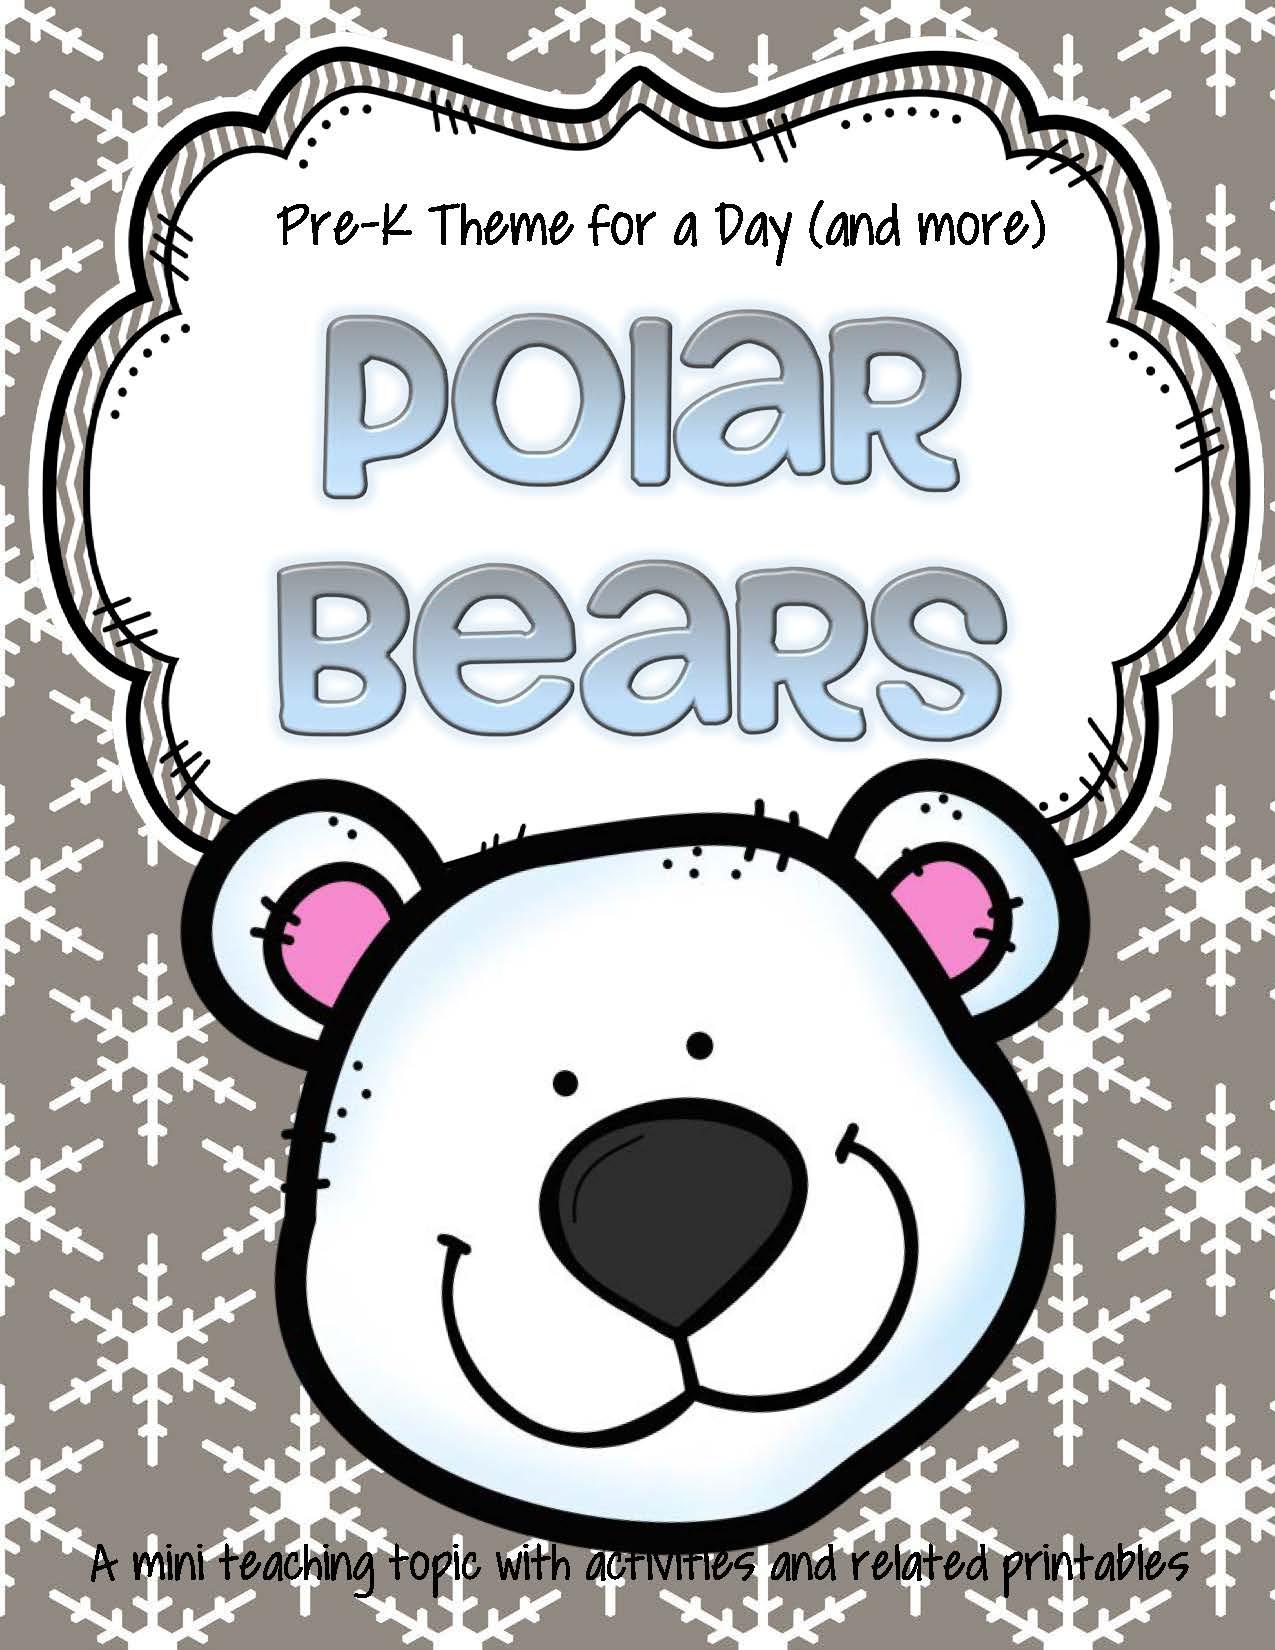 Theme Activities And Printables For Preschool Pre K And Kindergarten